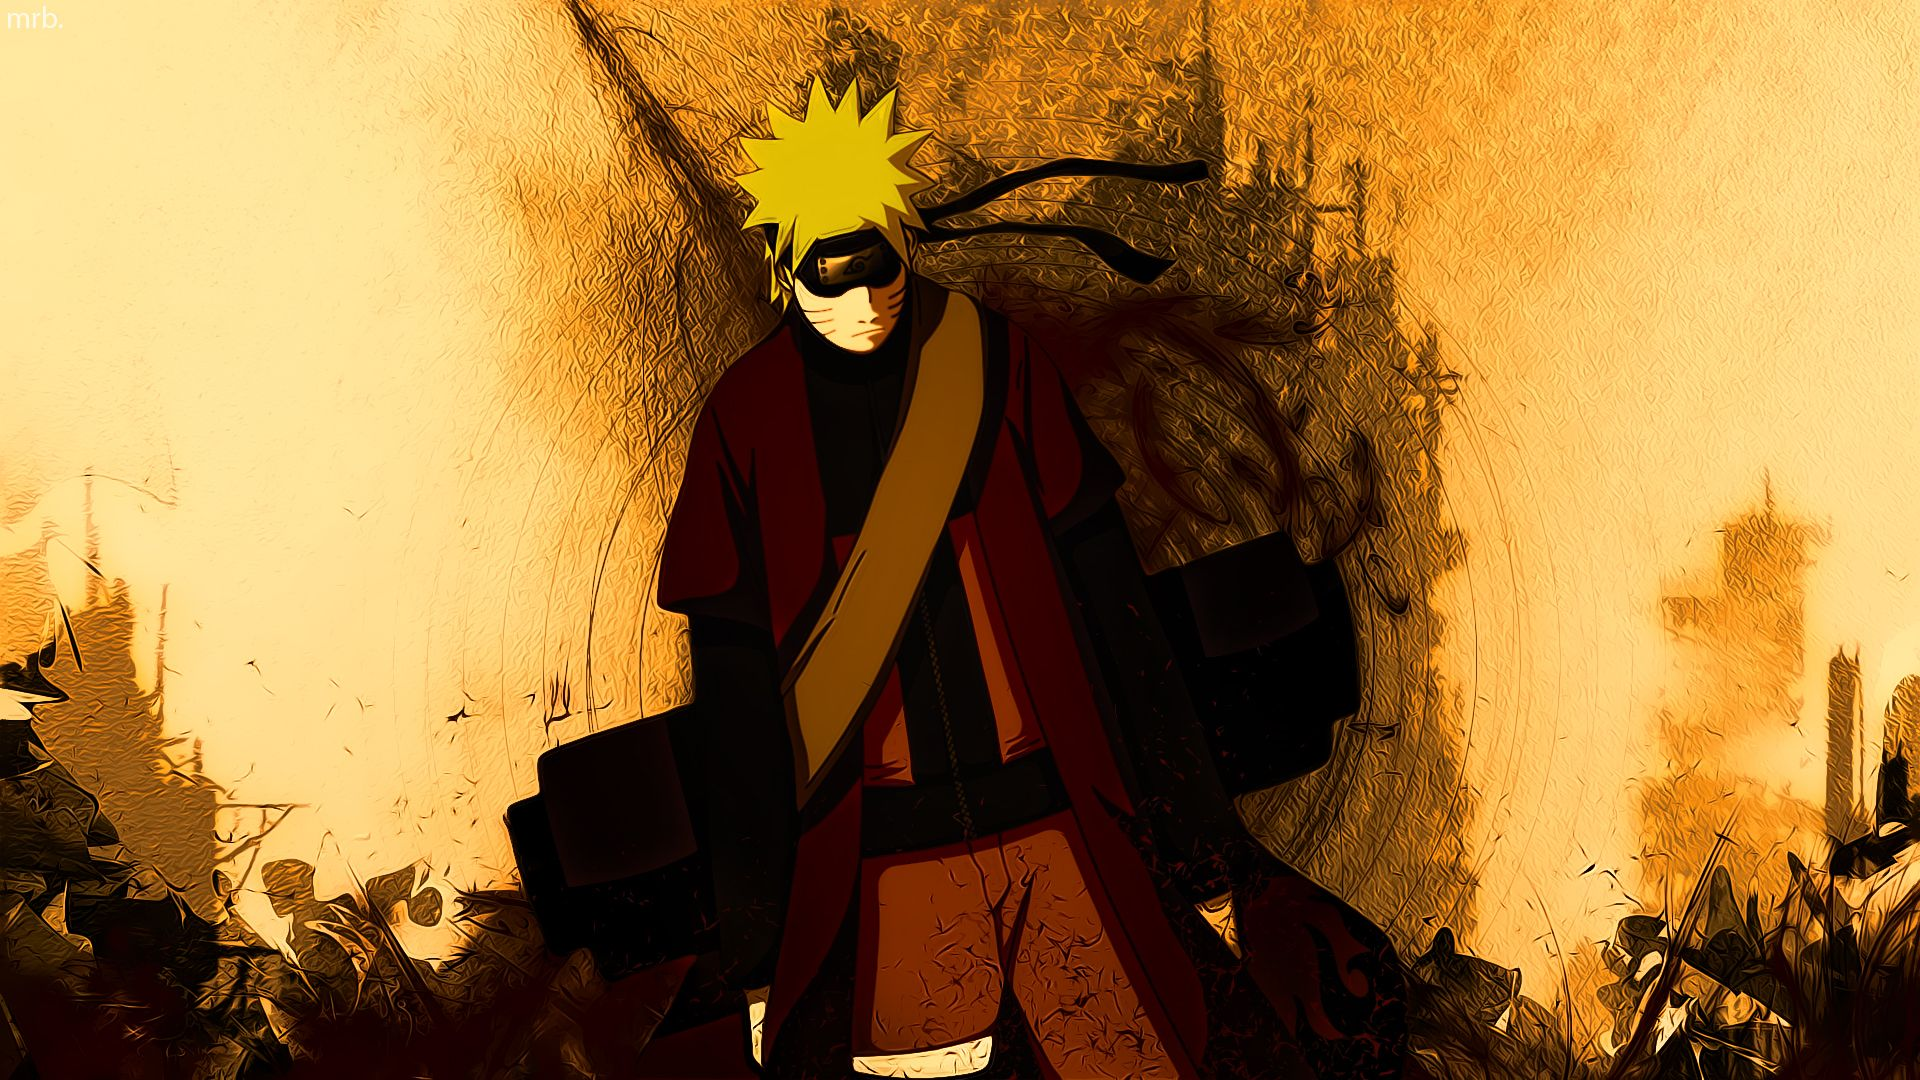 Top Wallpaper Angry Naruto Uzumaki - 511b571b343bbdbbcc70f2974aecab76  Picture_583063      .jpg